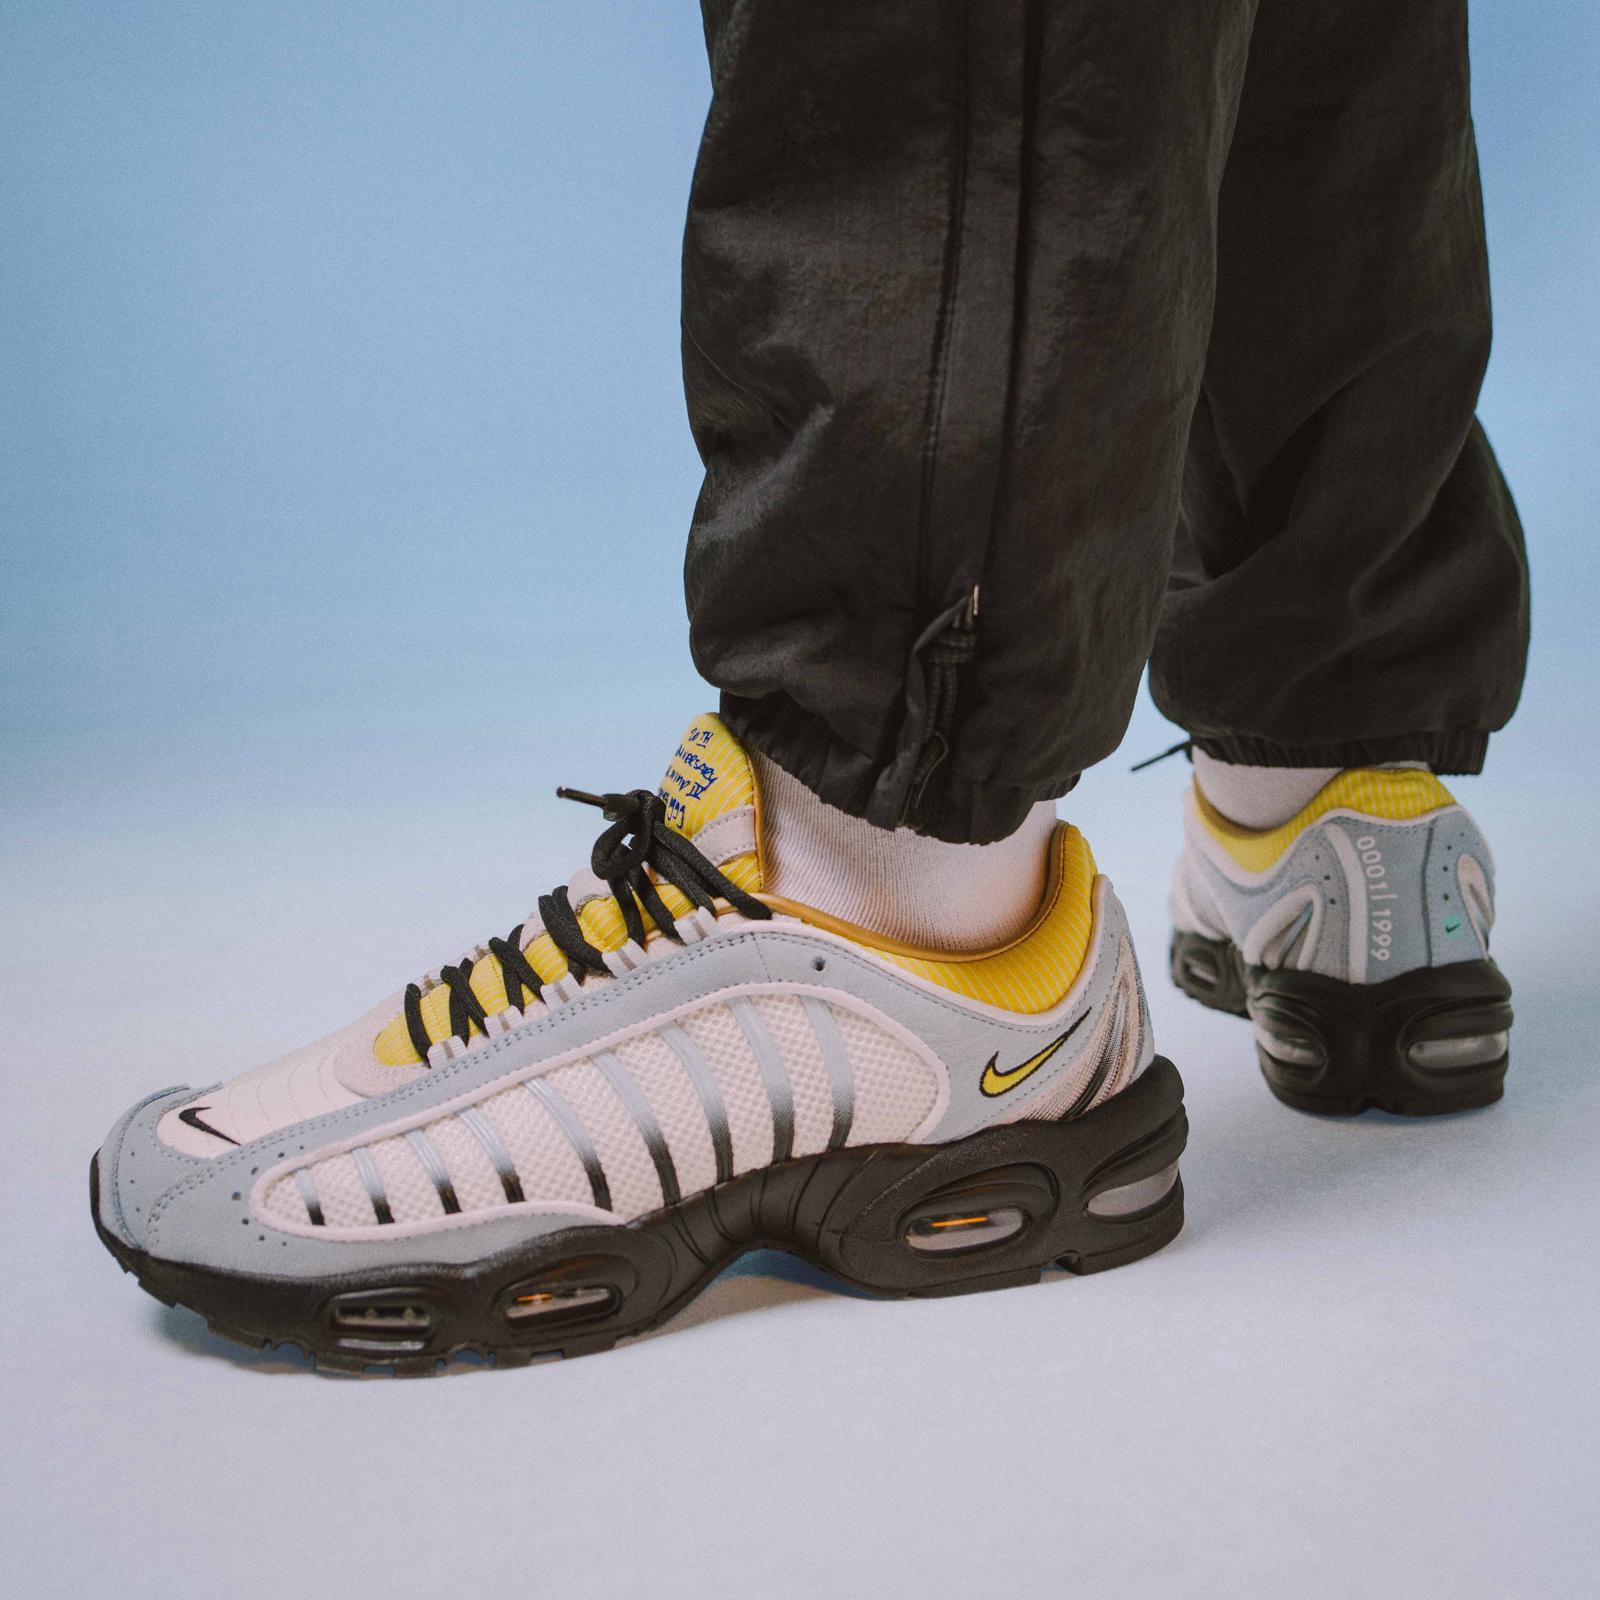 Sneakersnstuff x Nike Air Max Tailwind 20th Anniversary